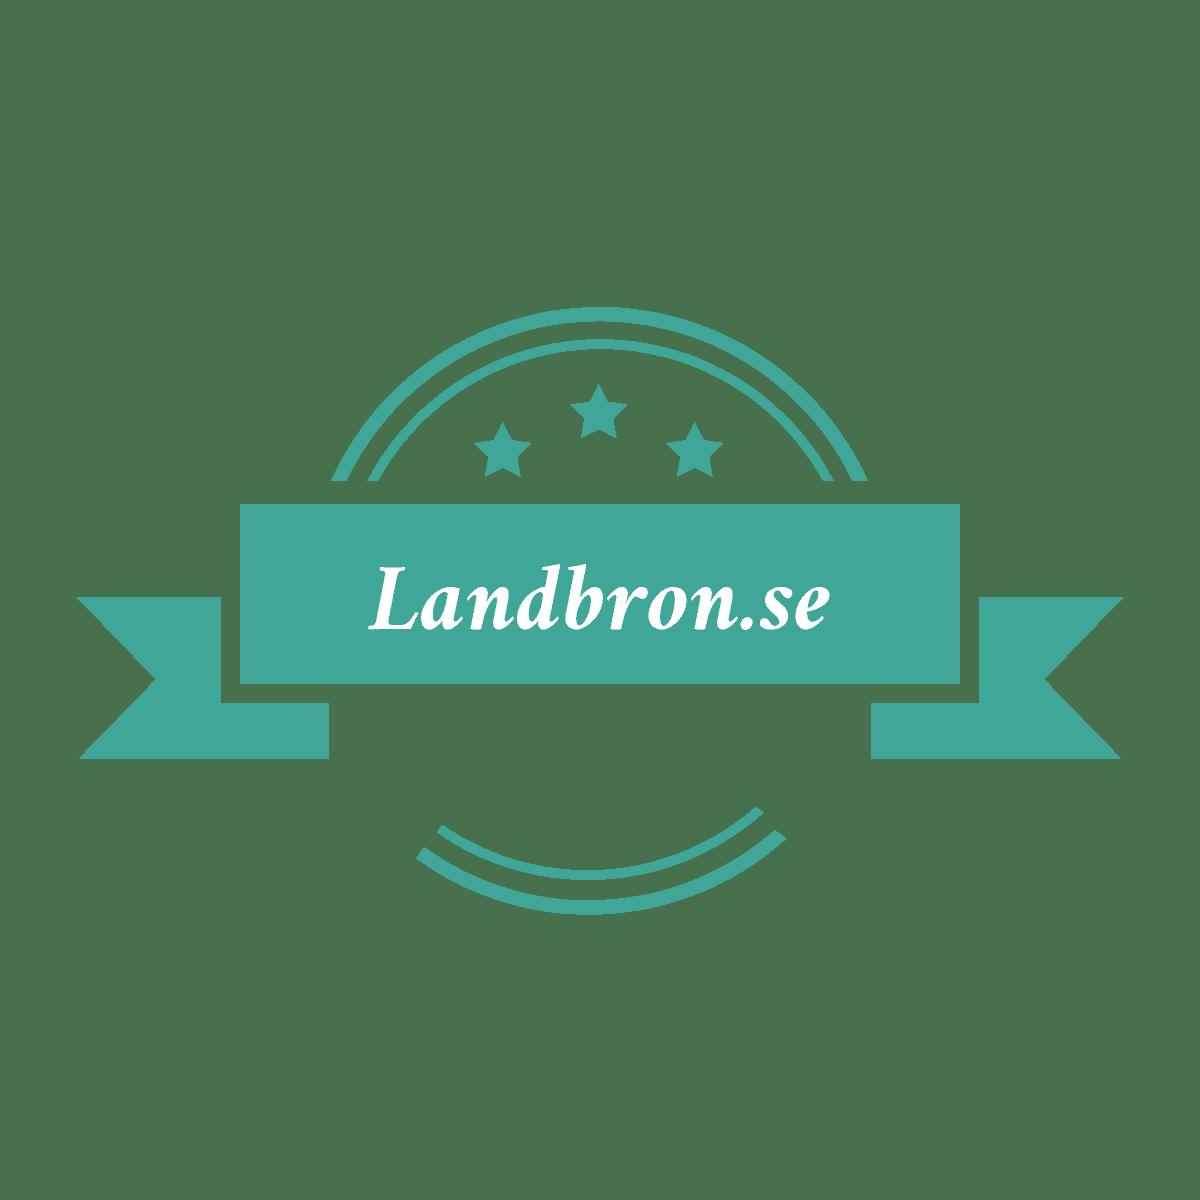 Landbron